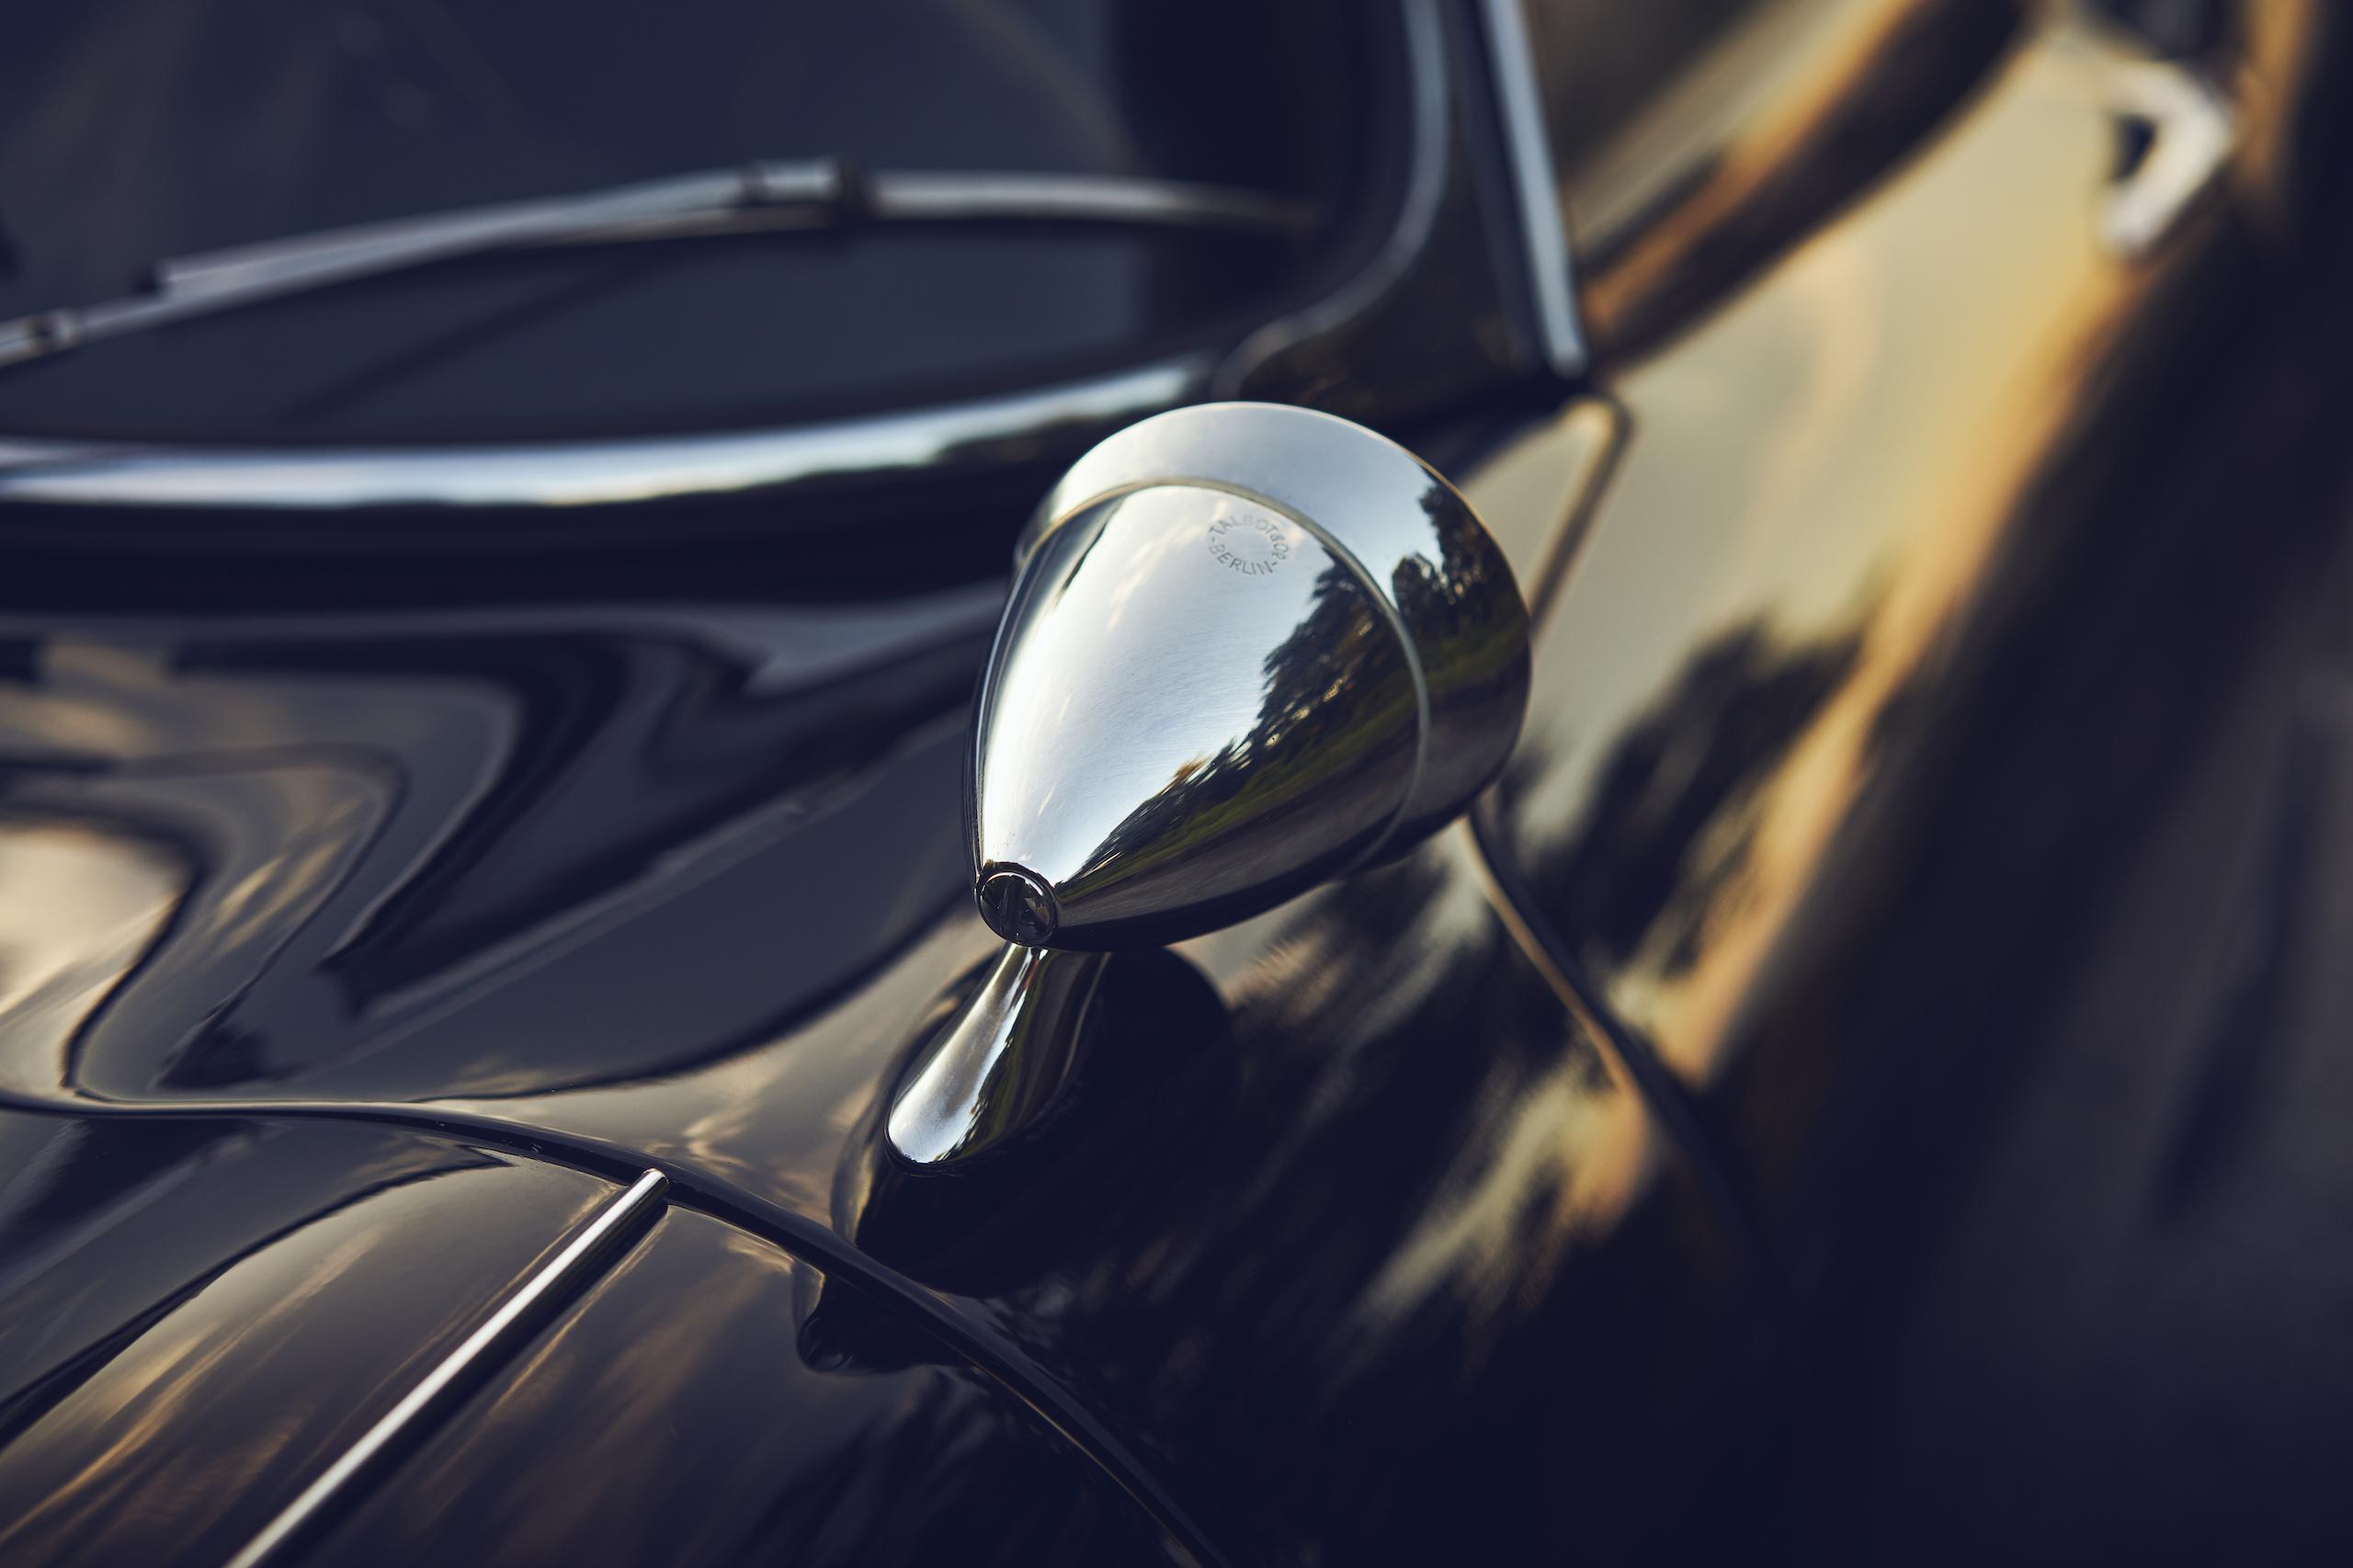 Jaguar E-Type mirror detail